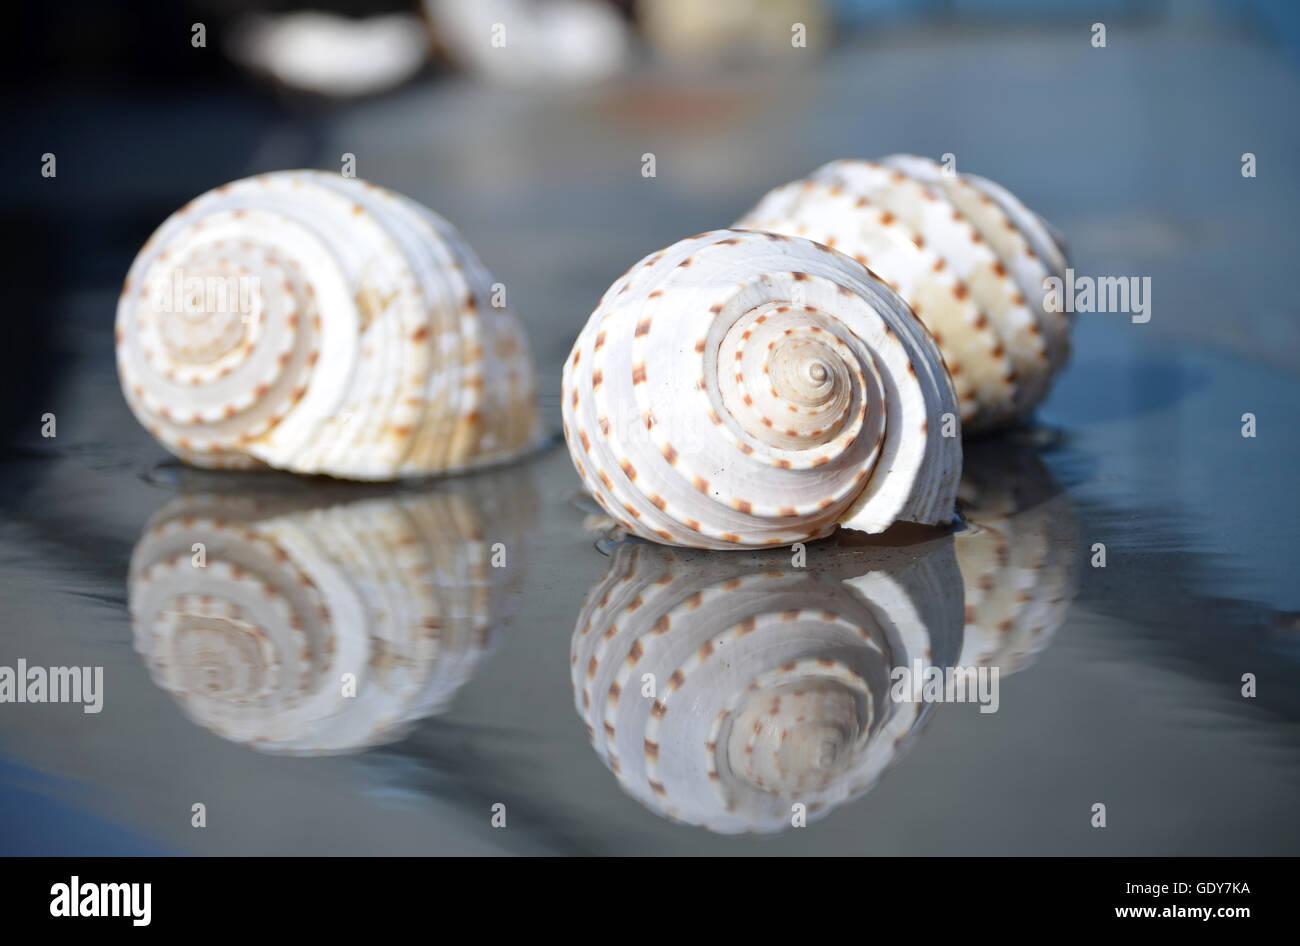 tonnidae with reflection - Stock Image